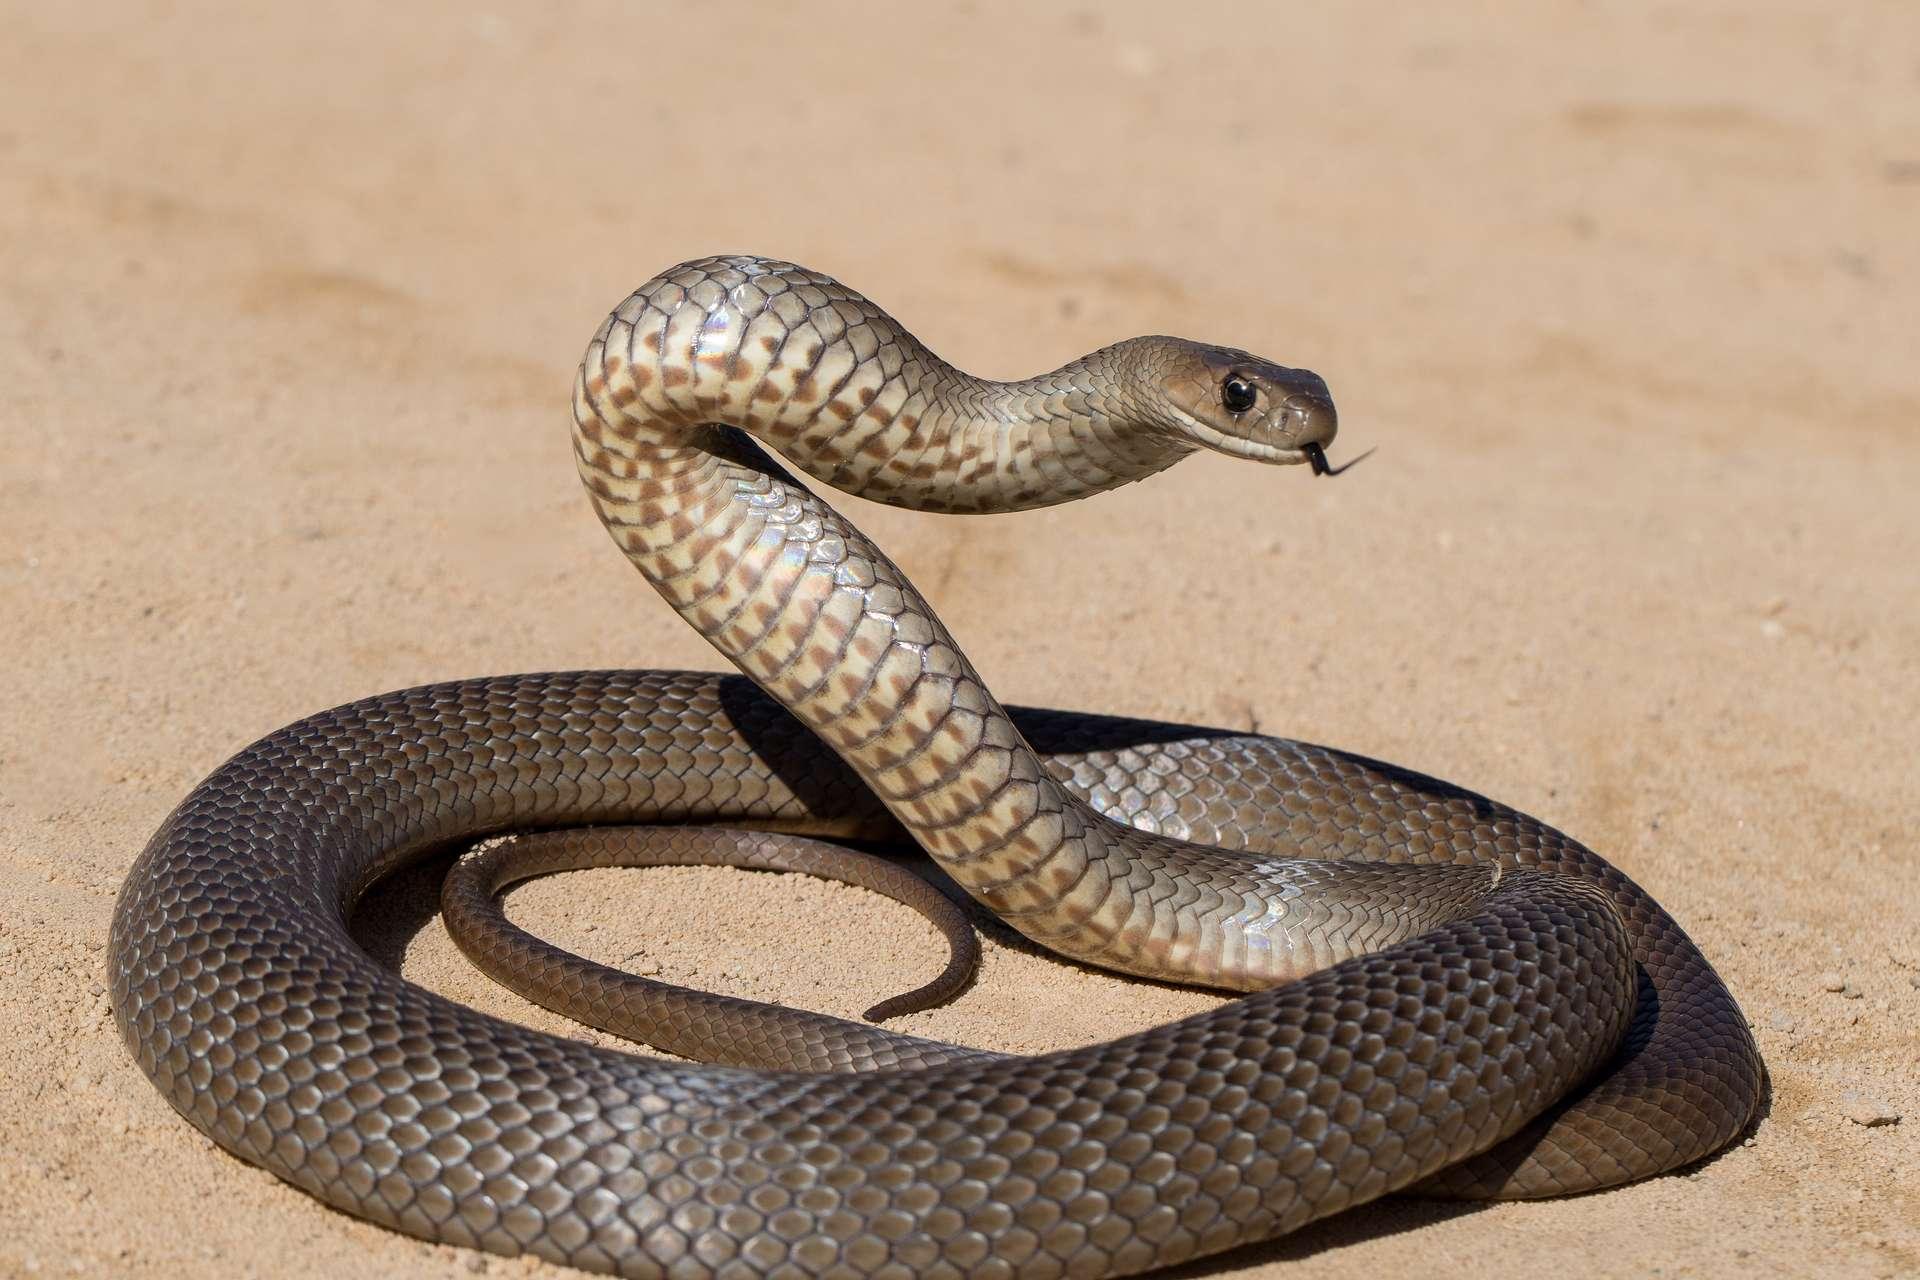 Les adultes de l'espèce Pseudonaja textilis peuvent atteindre 2m de long ! © Ken, Adobe Stock